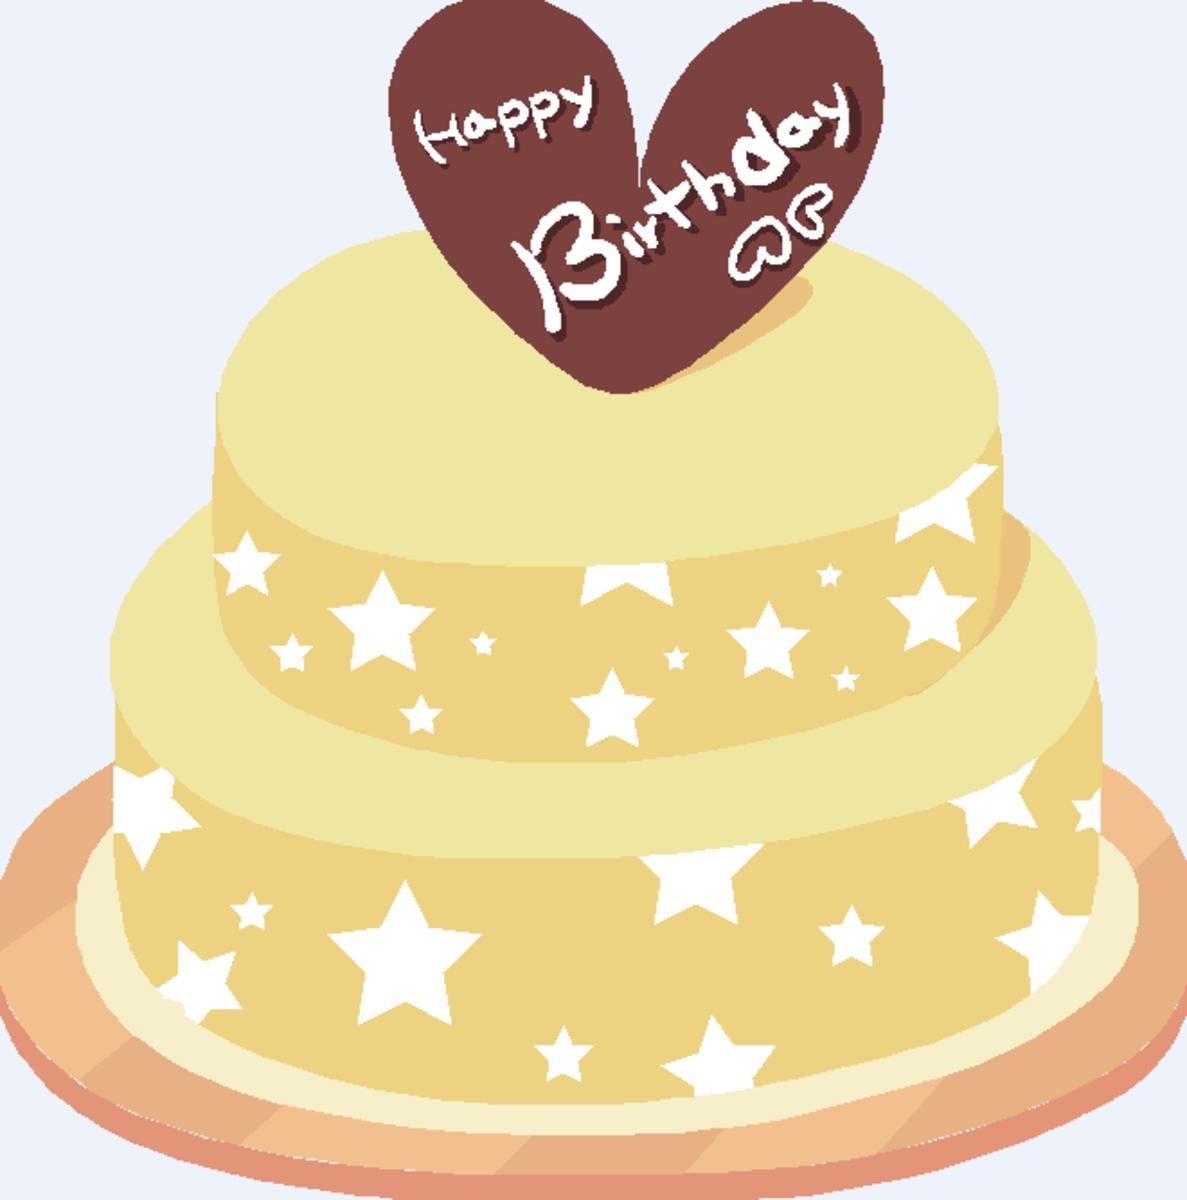 Birthday Cake with Chocolate Heart